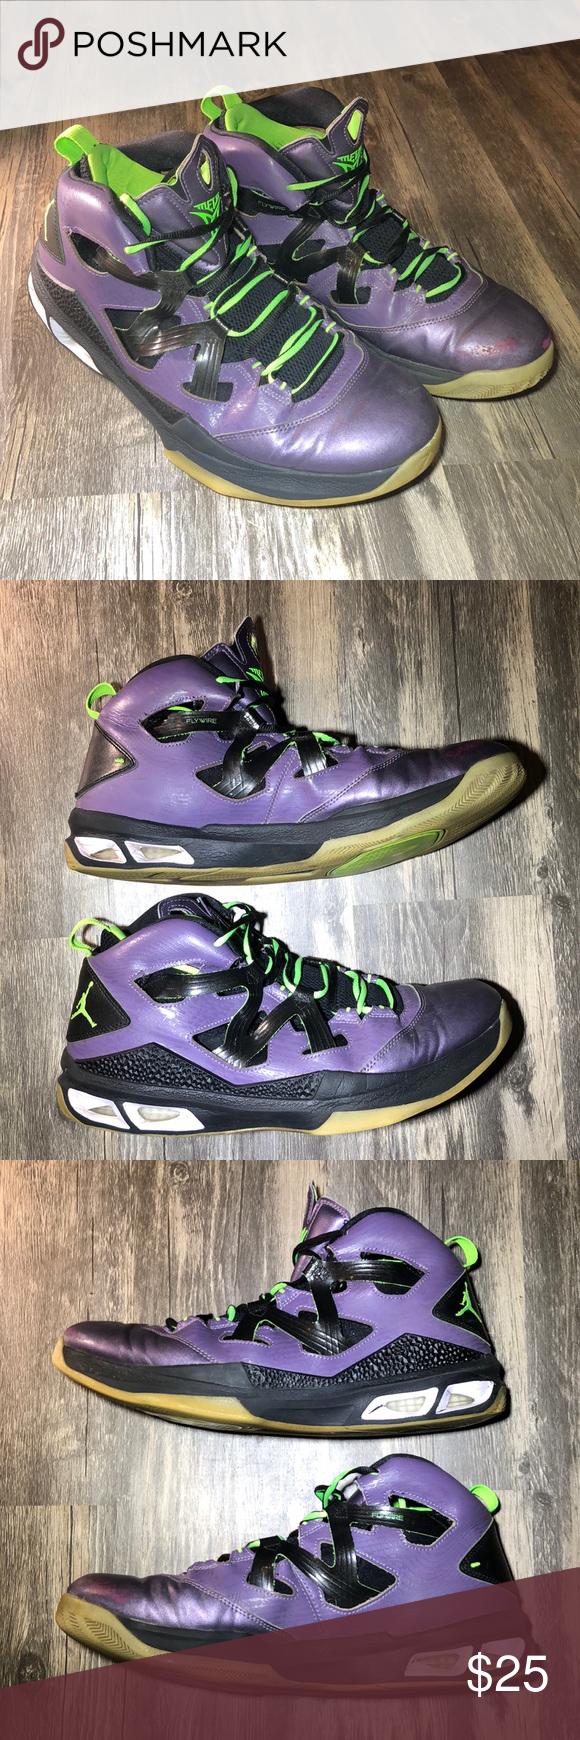 cheap for discount 3c6af efe7f Air Jordan Nike Jordan Melo M9 Blacklight Pre-owned (no box) Jordan Melo